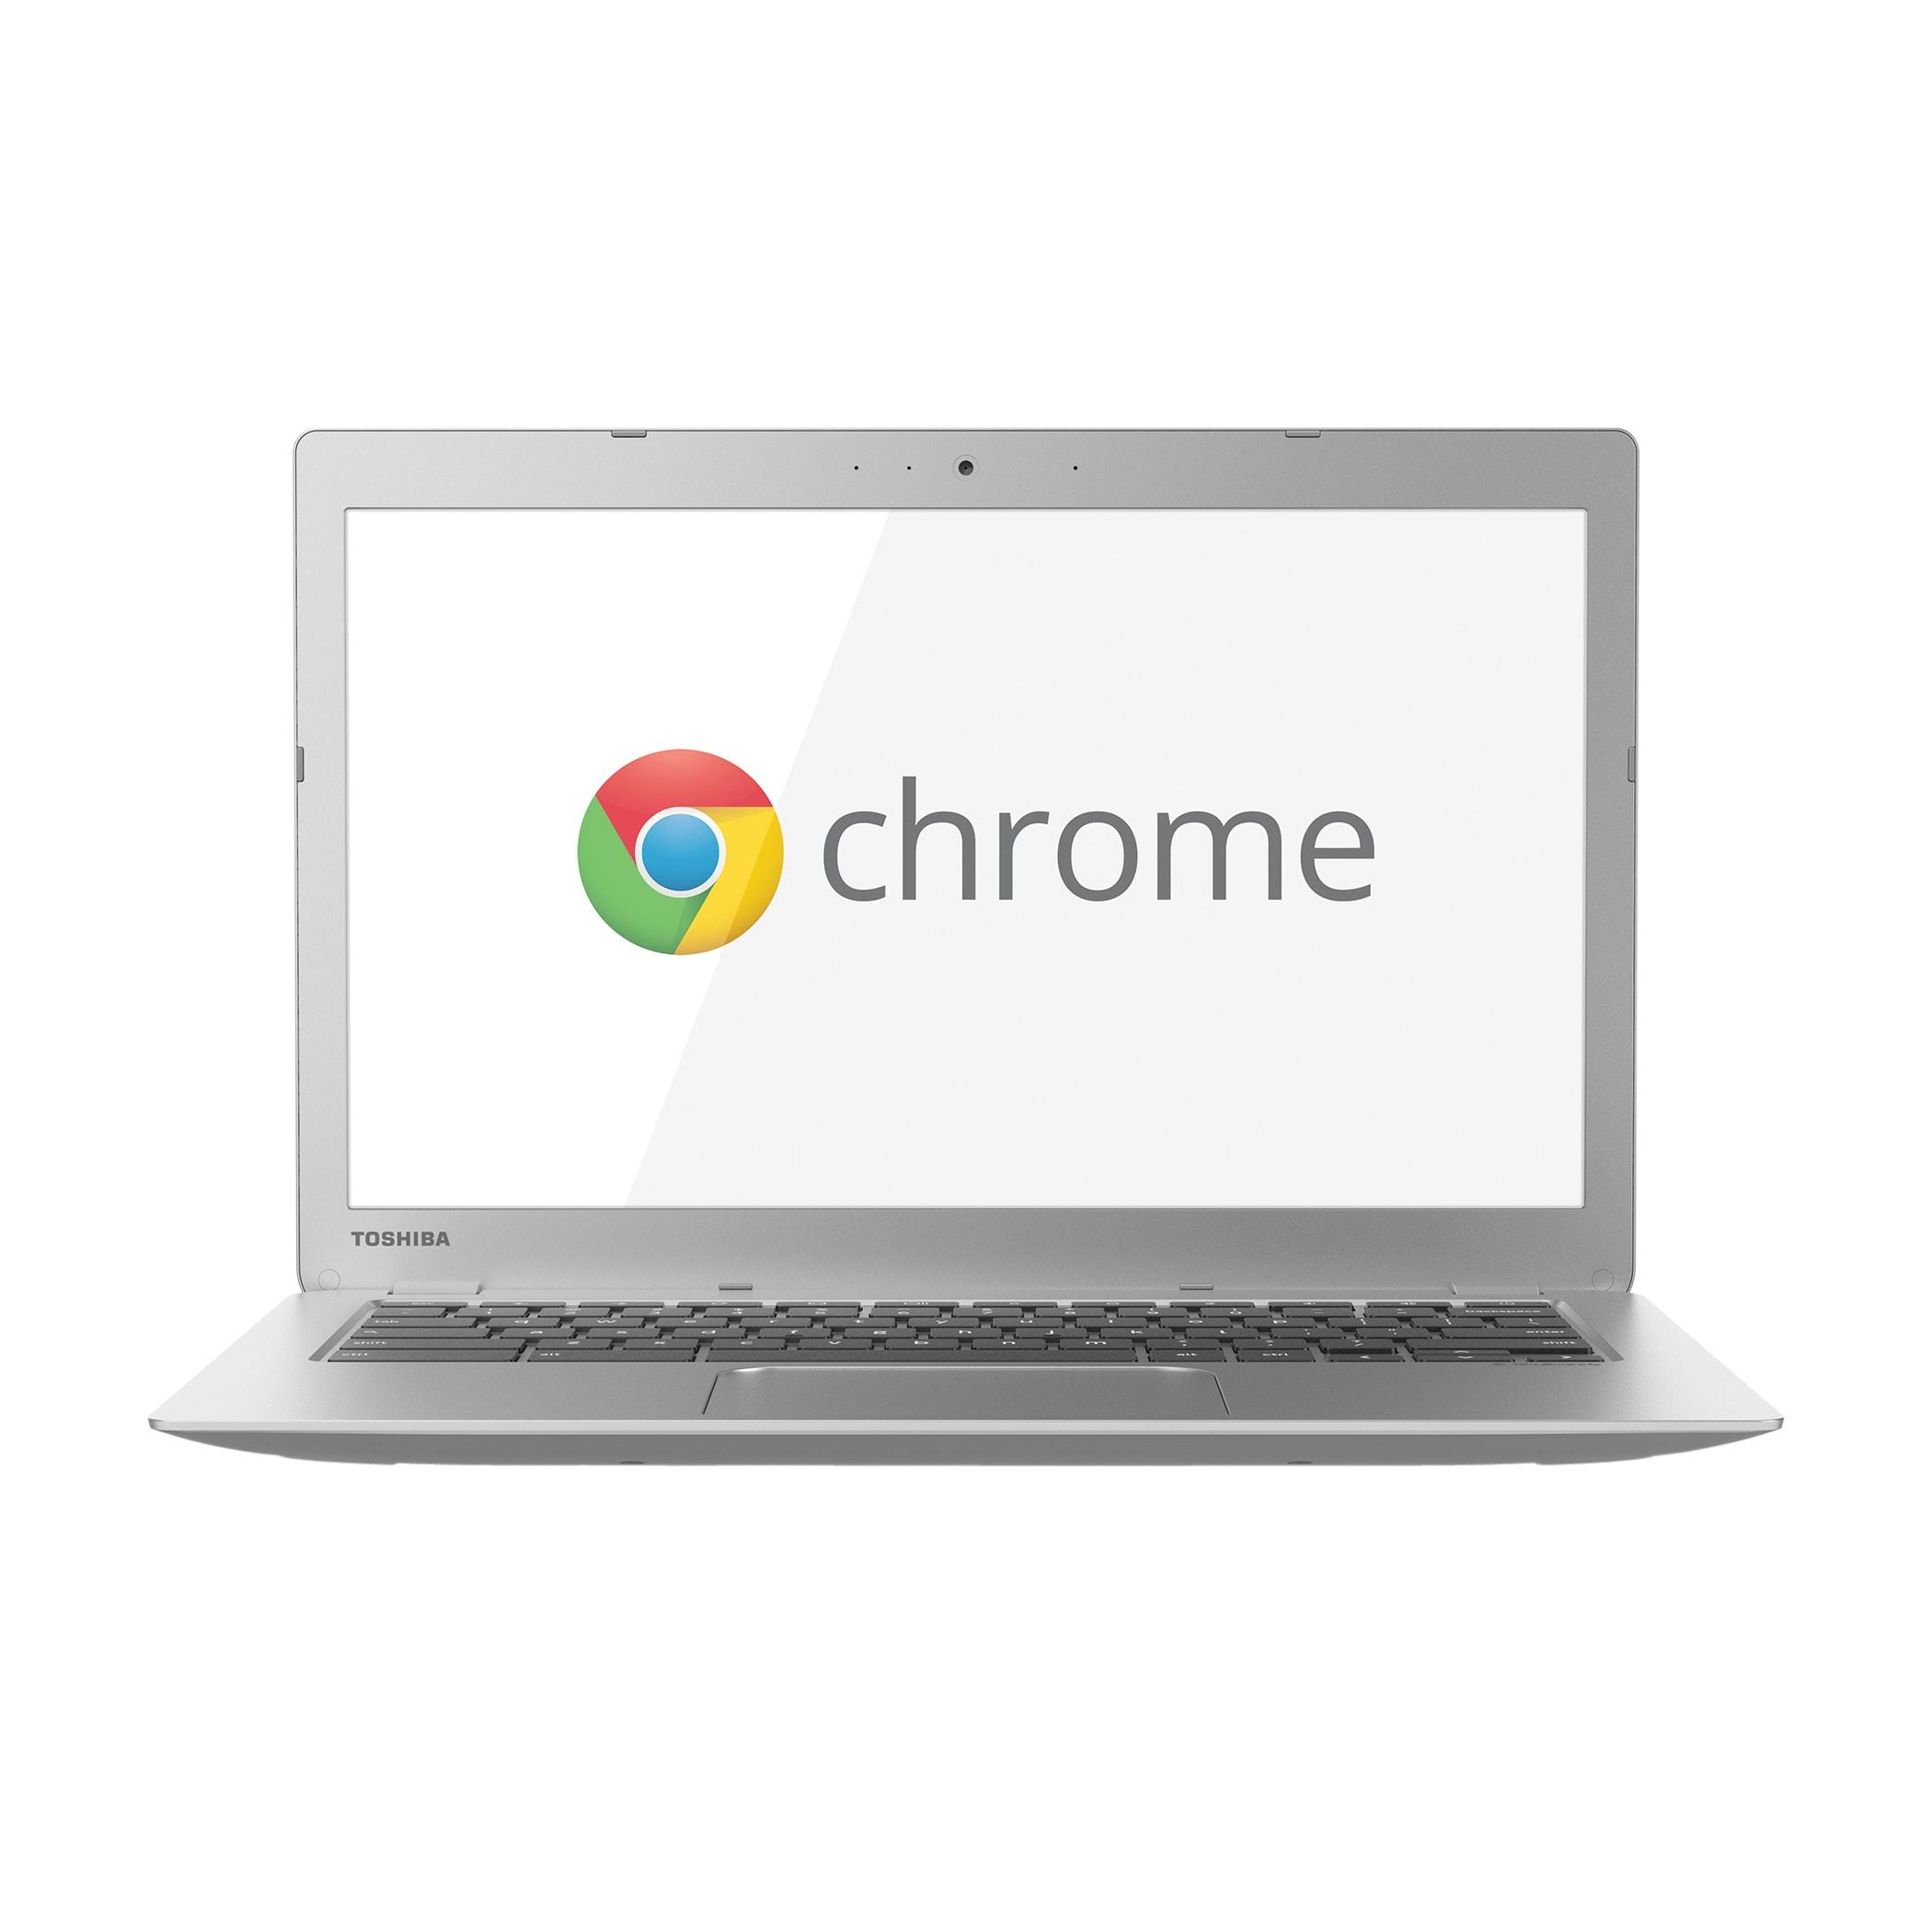 "Toshiba Chromebook With 13.3"" Diagonal Display & Intel® Celeron® Processor, CB35-B3330"